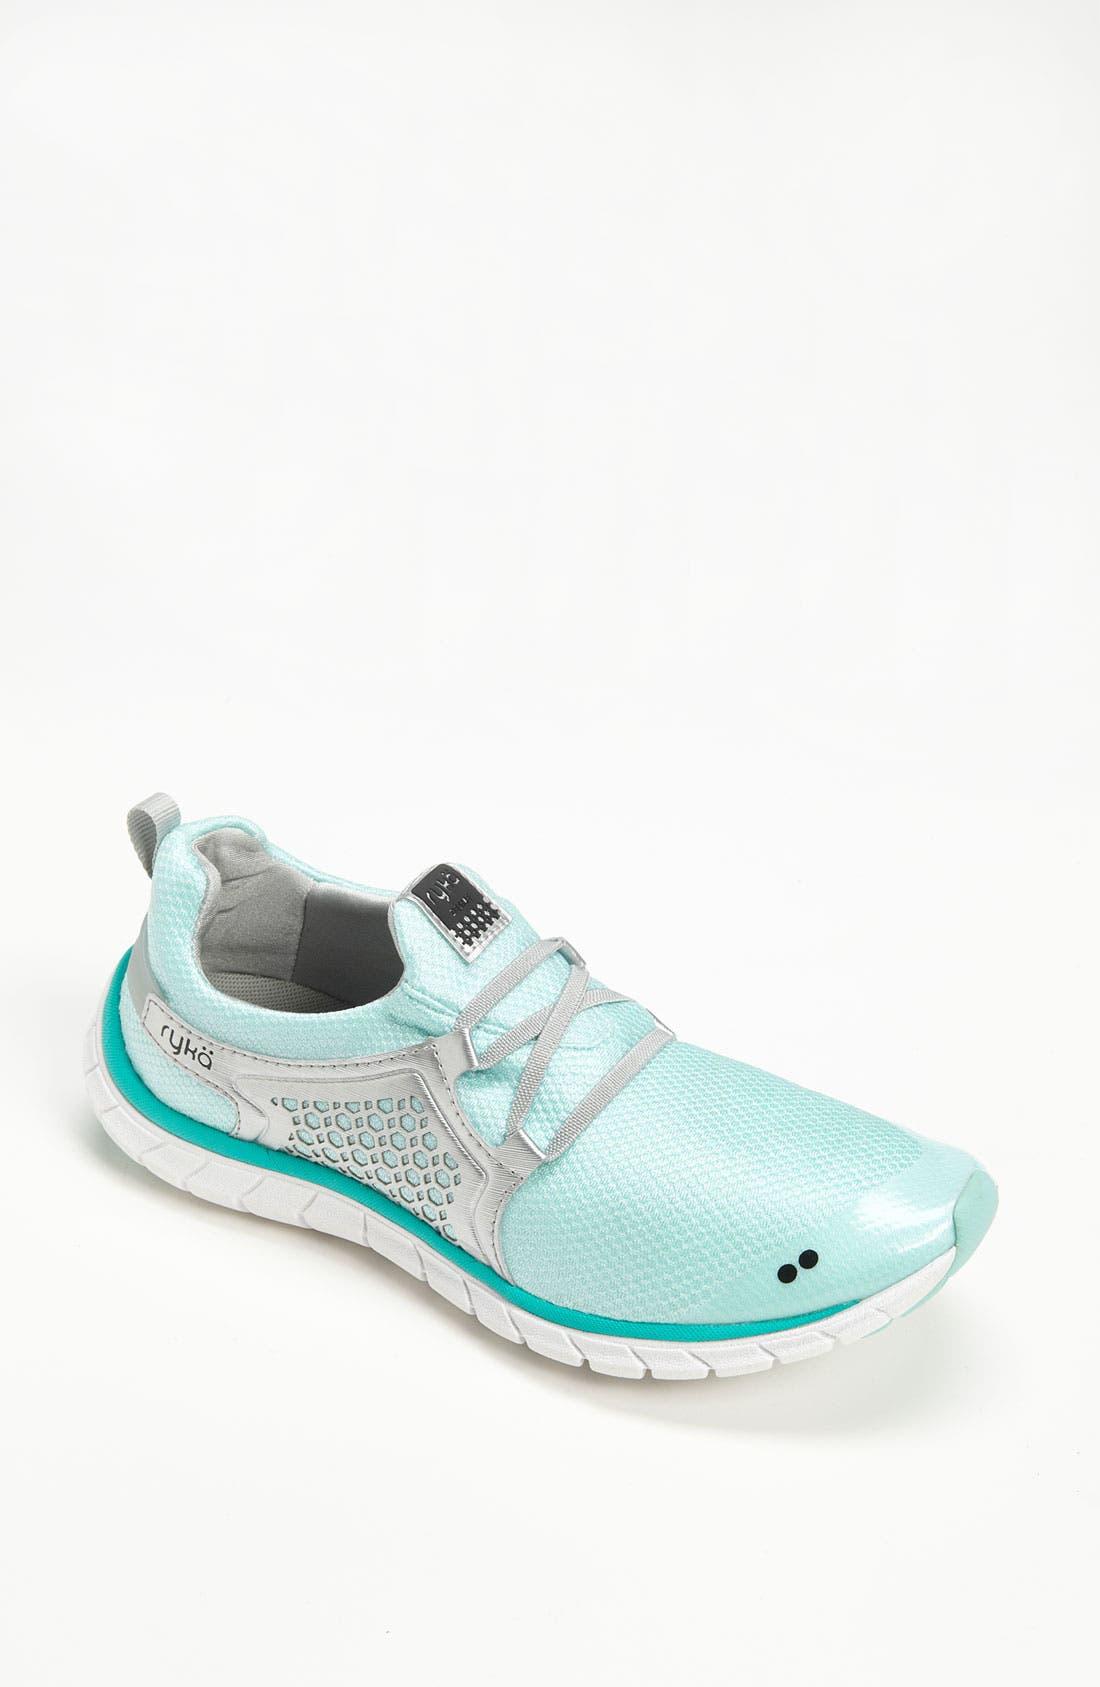 Alternate Image 1 Selected - rykä 'Desire' Running Shoe (Women)